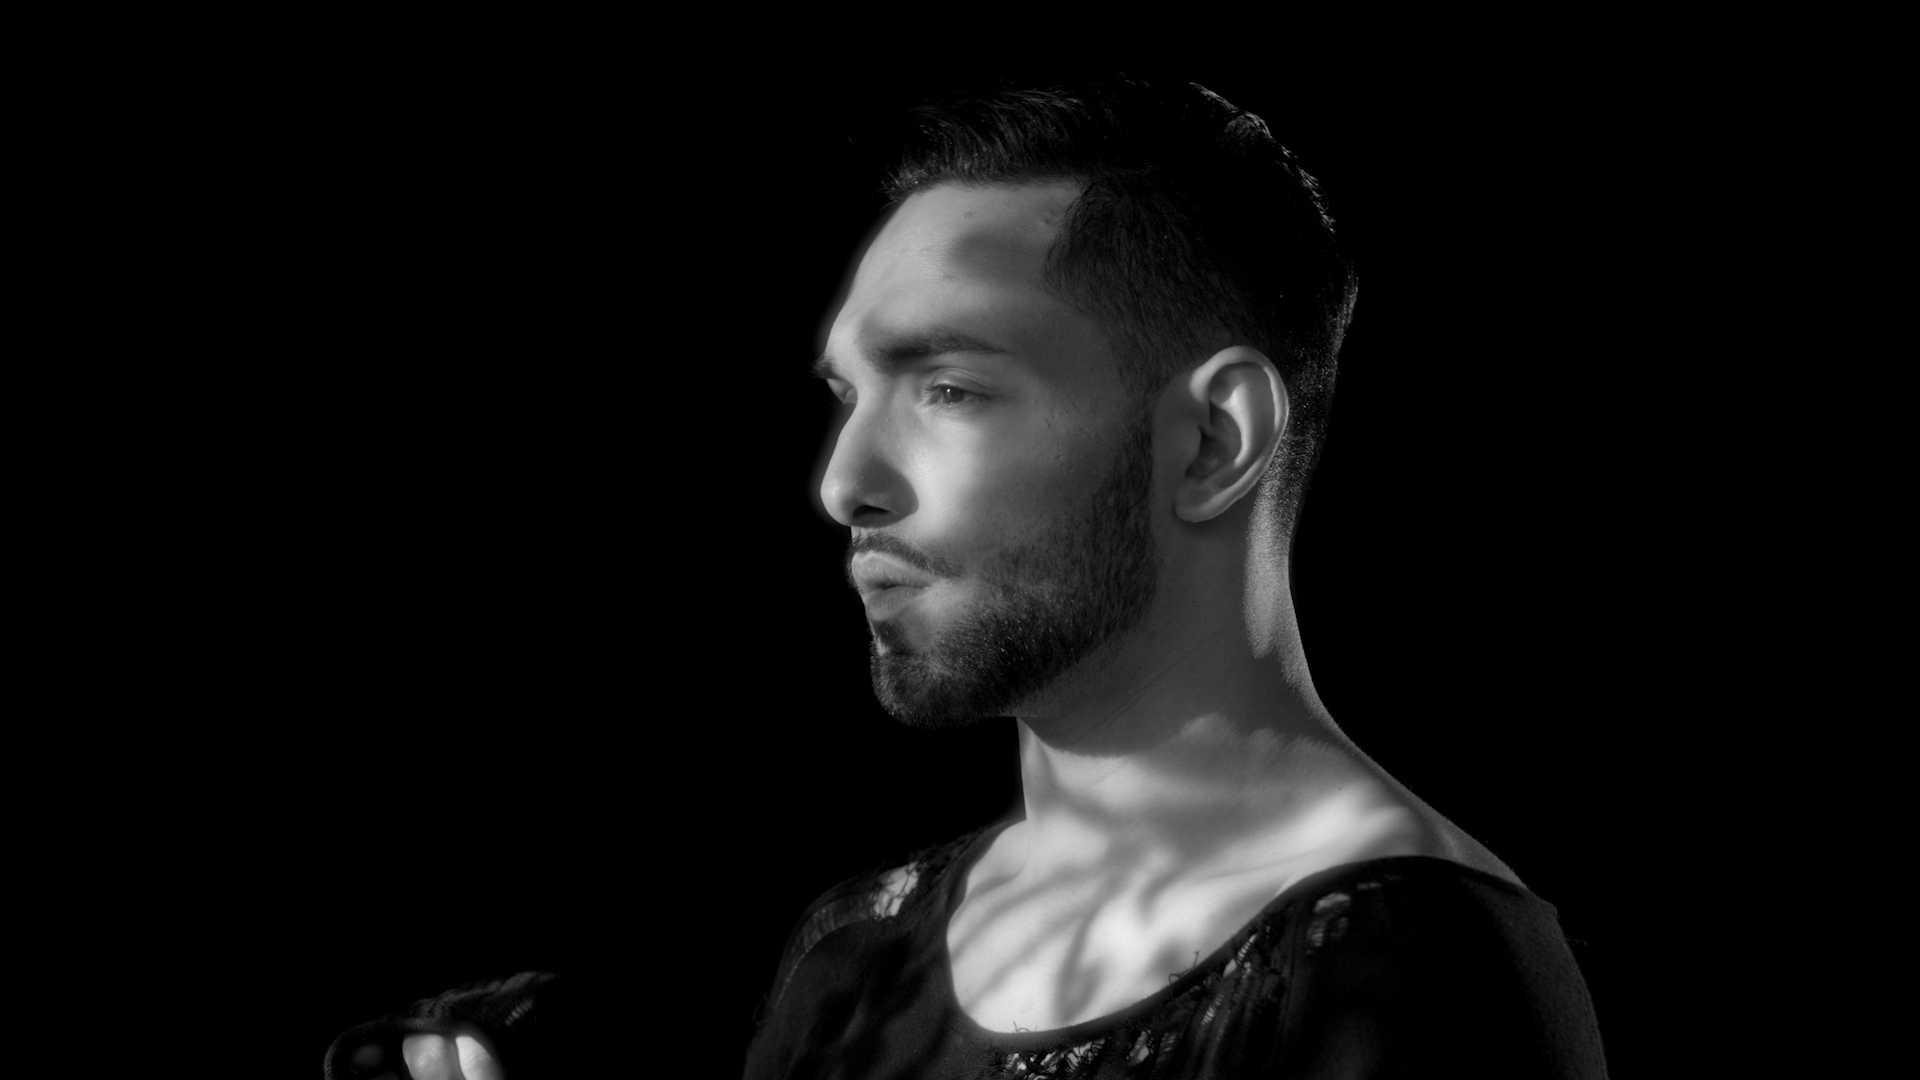 Low Budget Black & White music video